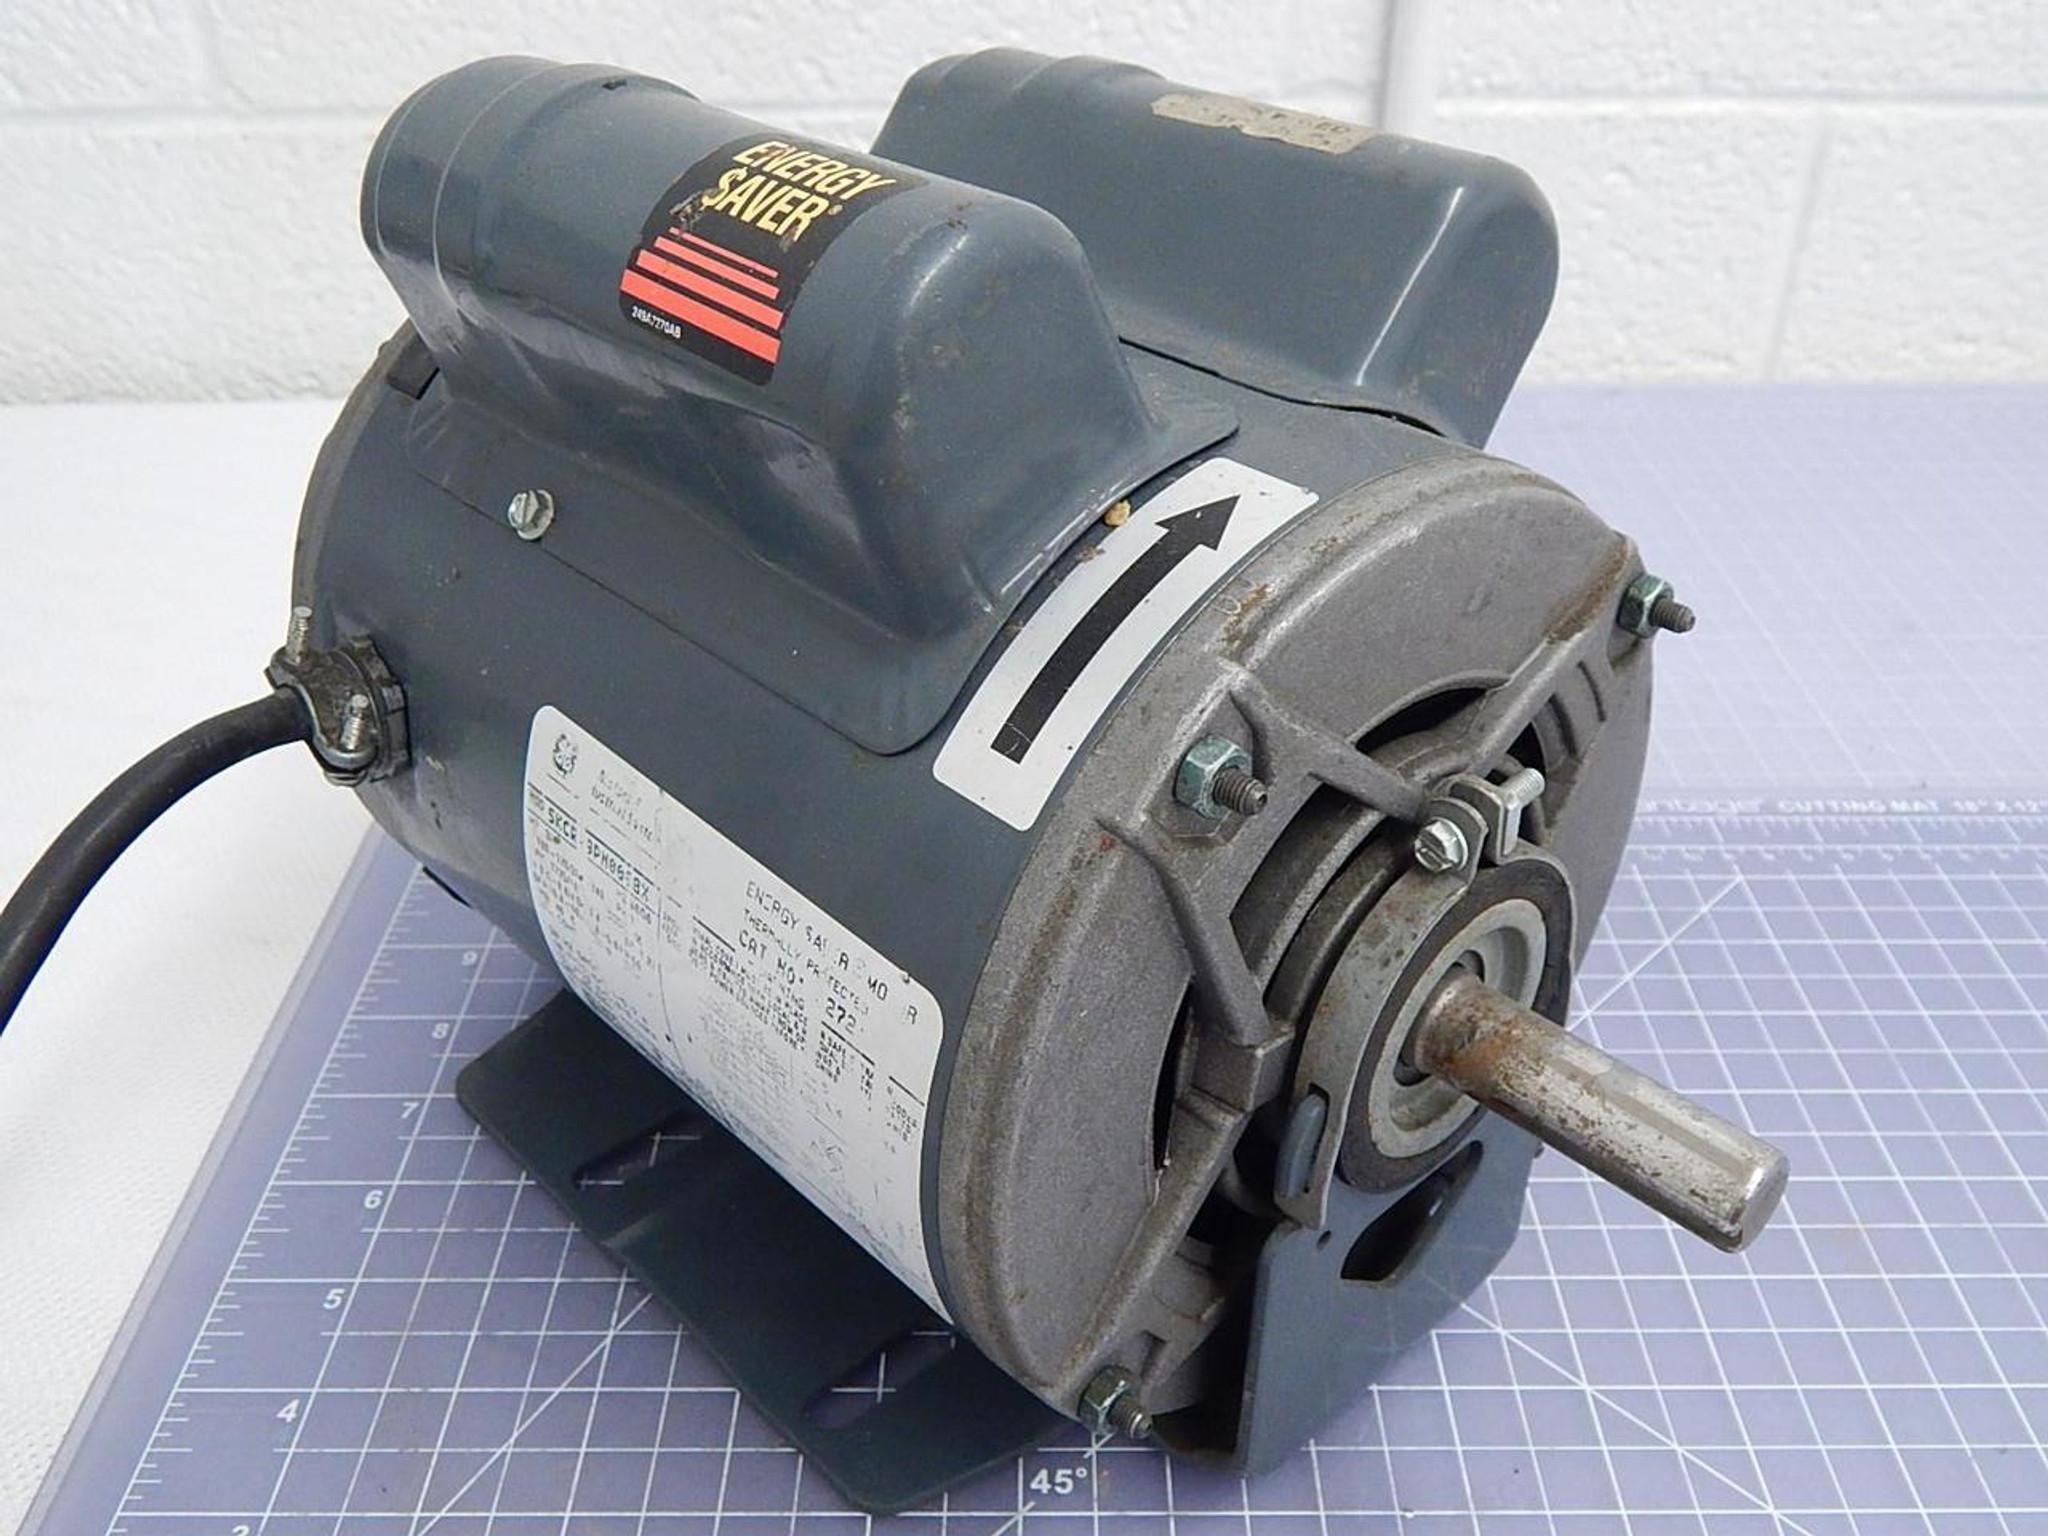 GE, General Electric 5KCR49PN0098X Motor 3/4 HP, 1725/1425, 1 PH T100281